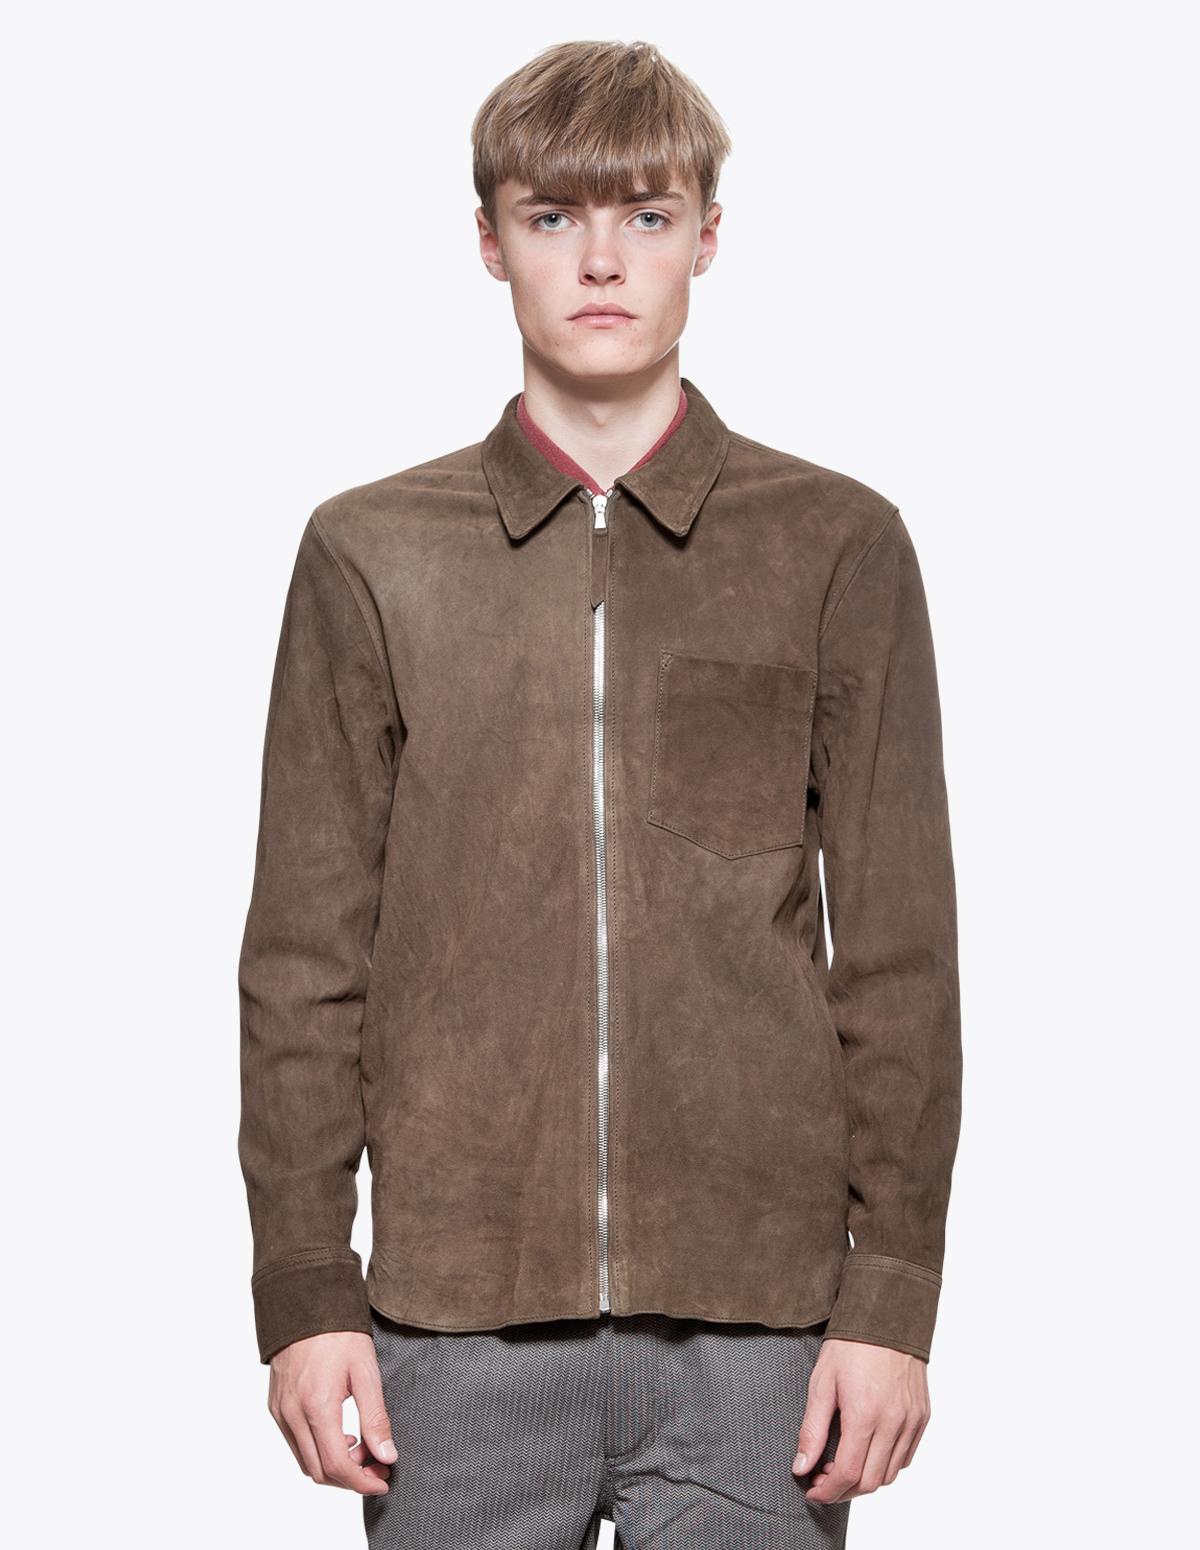 ol-shirt-suade-brown002.jpg